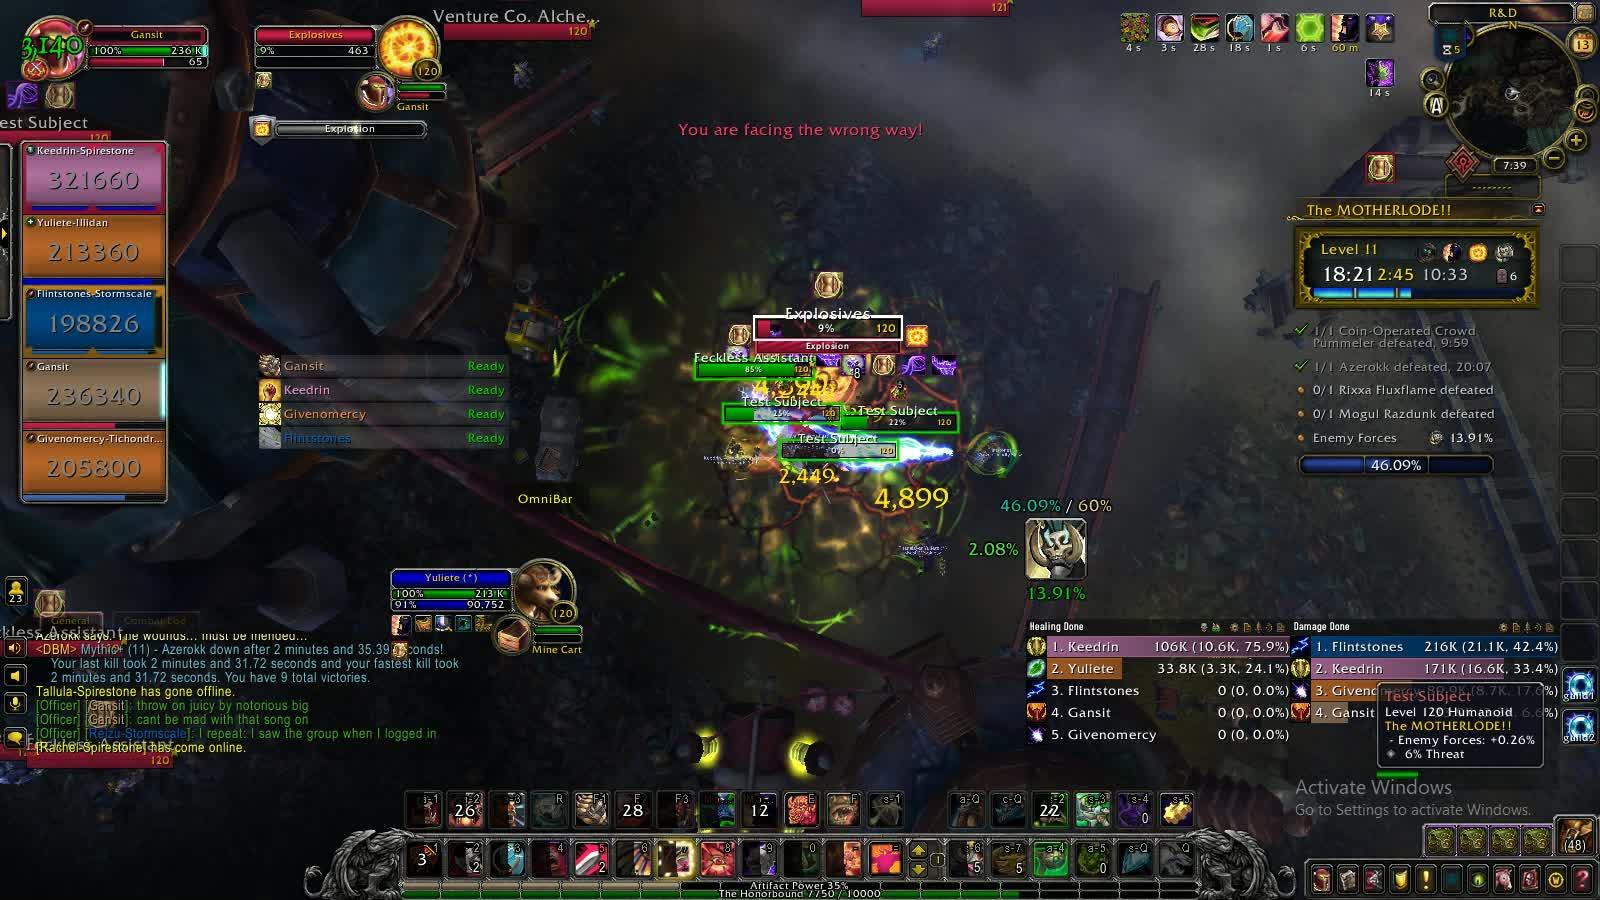 worldofwarcraft, World Of Warcraft 2019.04.13 - 19.39.37.08.DVR GIFs